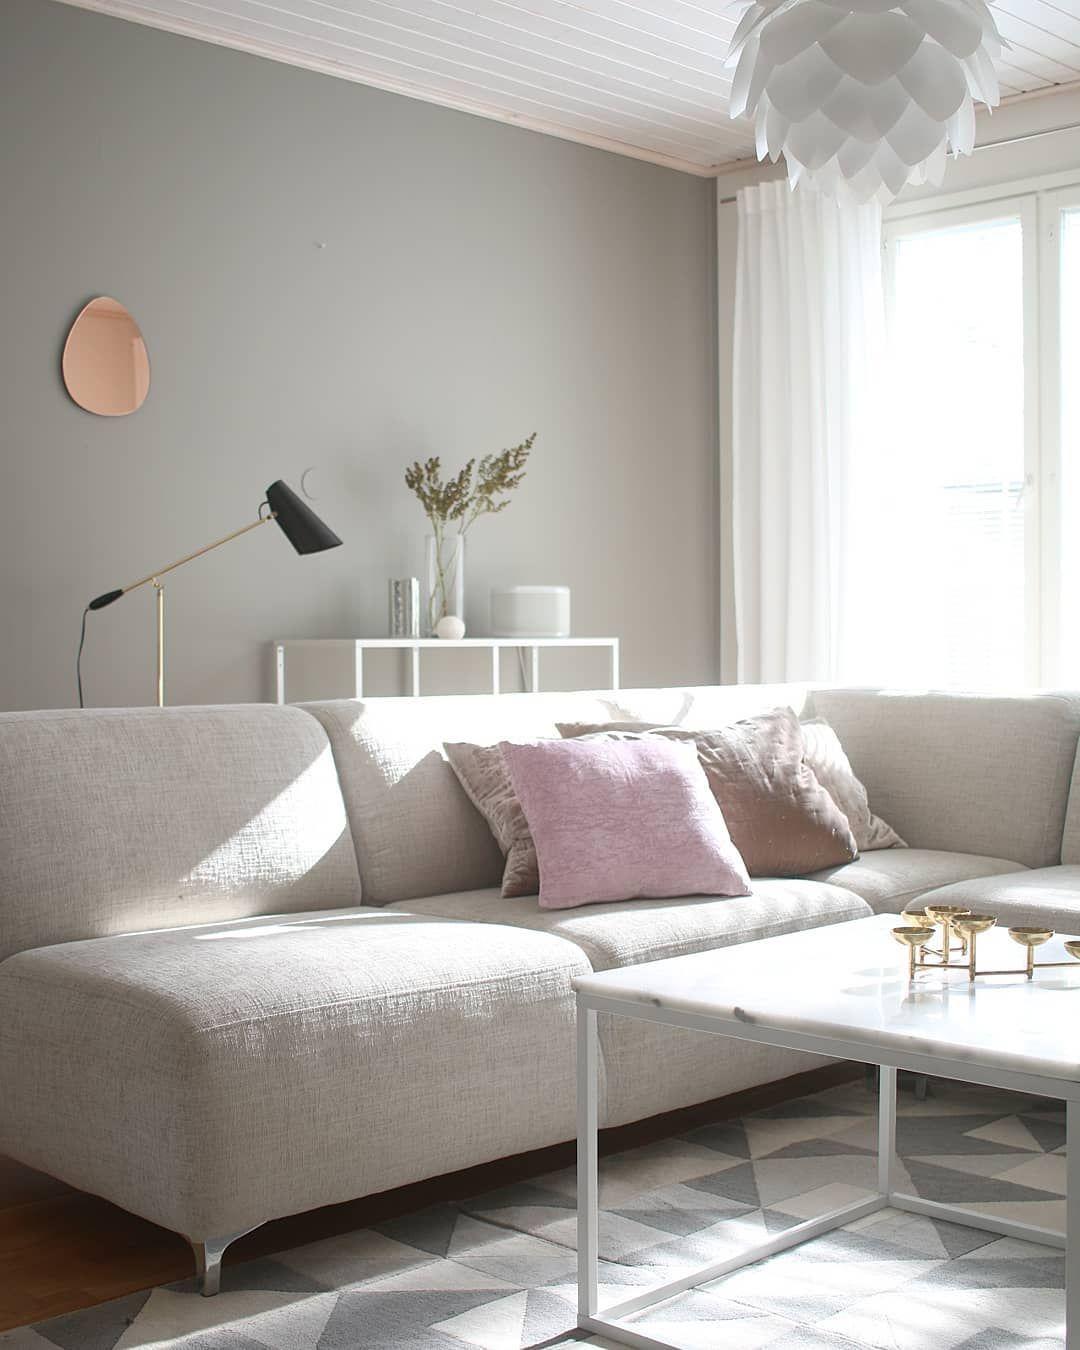 Monaco Kulmasohva Jaana Karhu Www Finsoffat Fi Tuote Monaco Modulisohva Living Room Furniture Decor